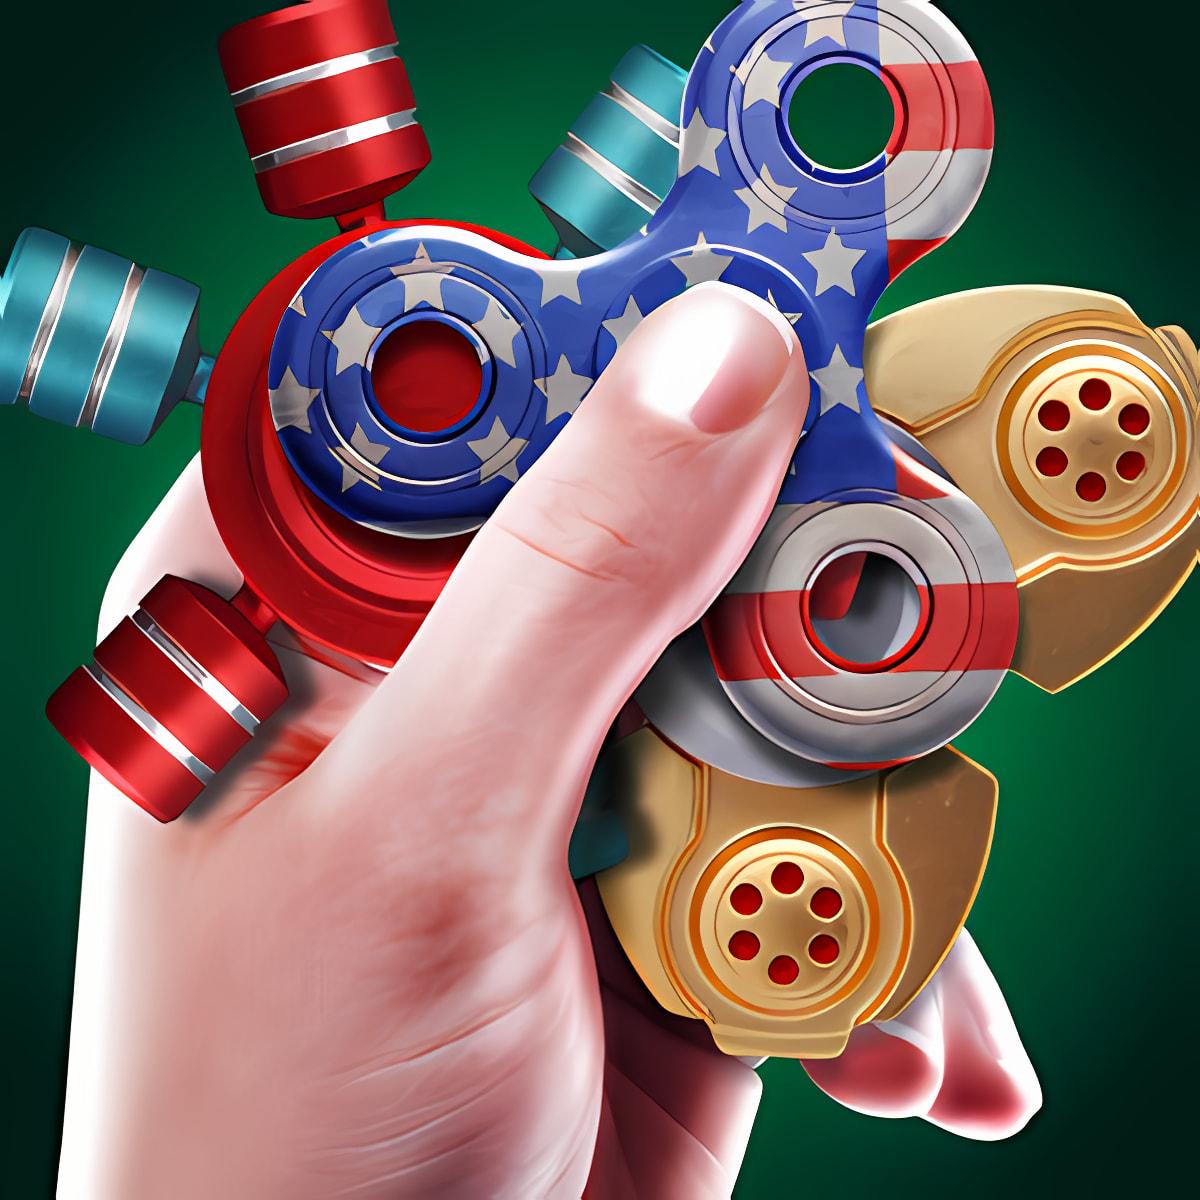 Pro hand fidget spinner 1.0